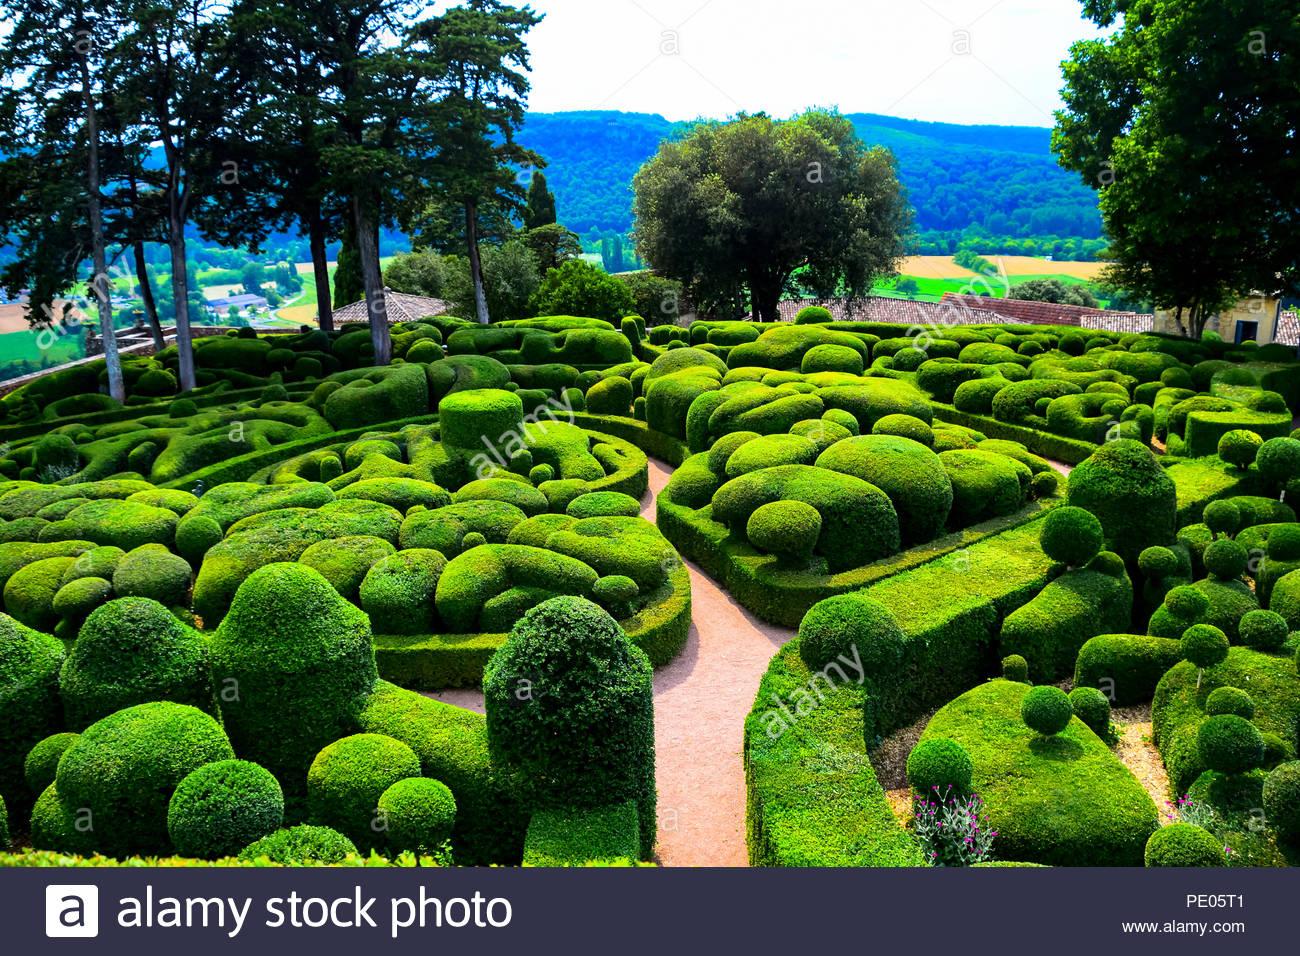 Jardin De Marqueyssac Luxe Gardens and topiary Of the Chateau De Marqueyssac Near the